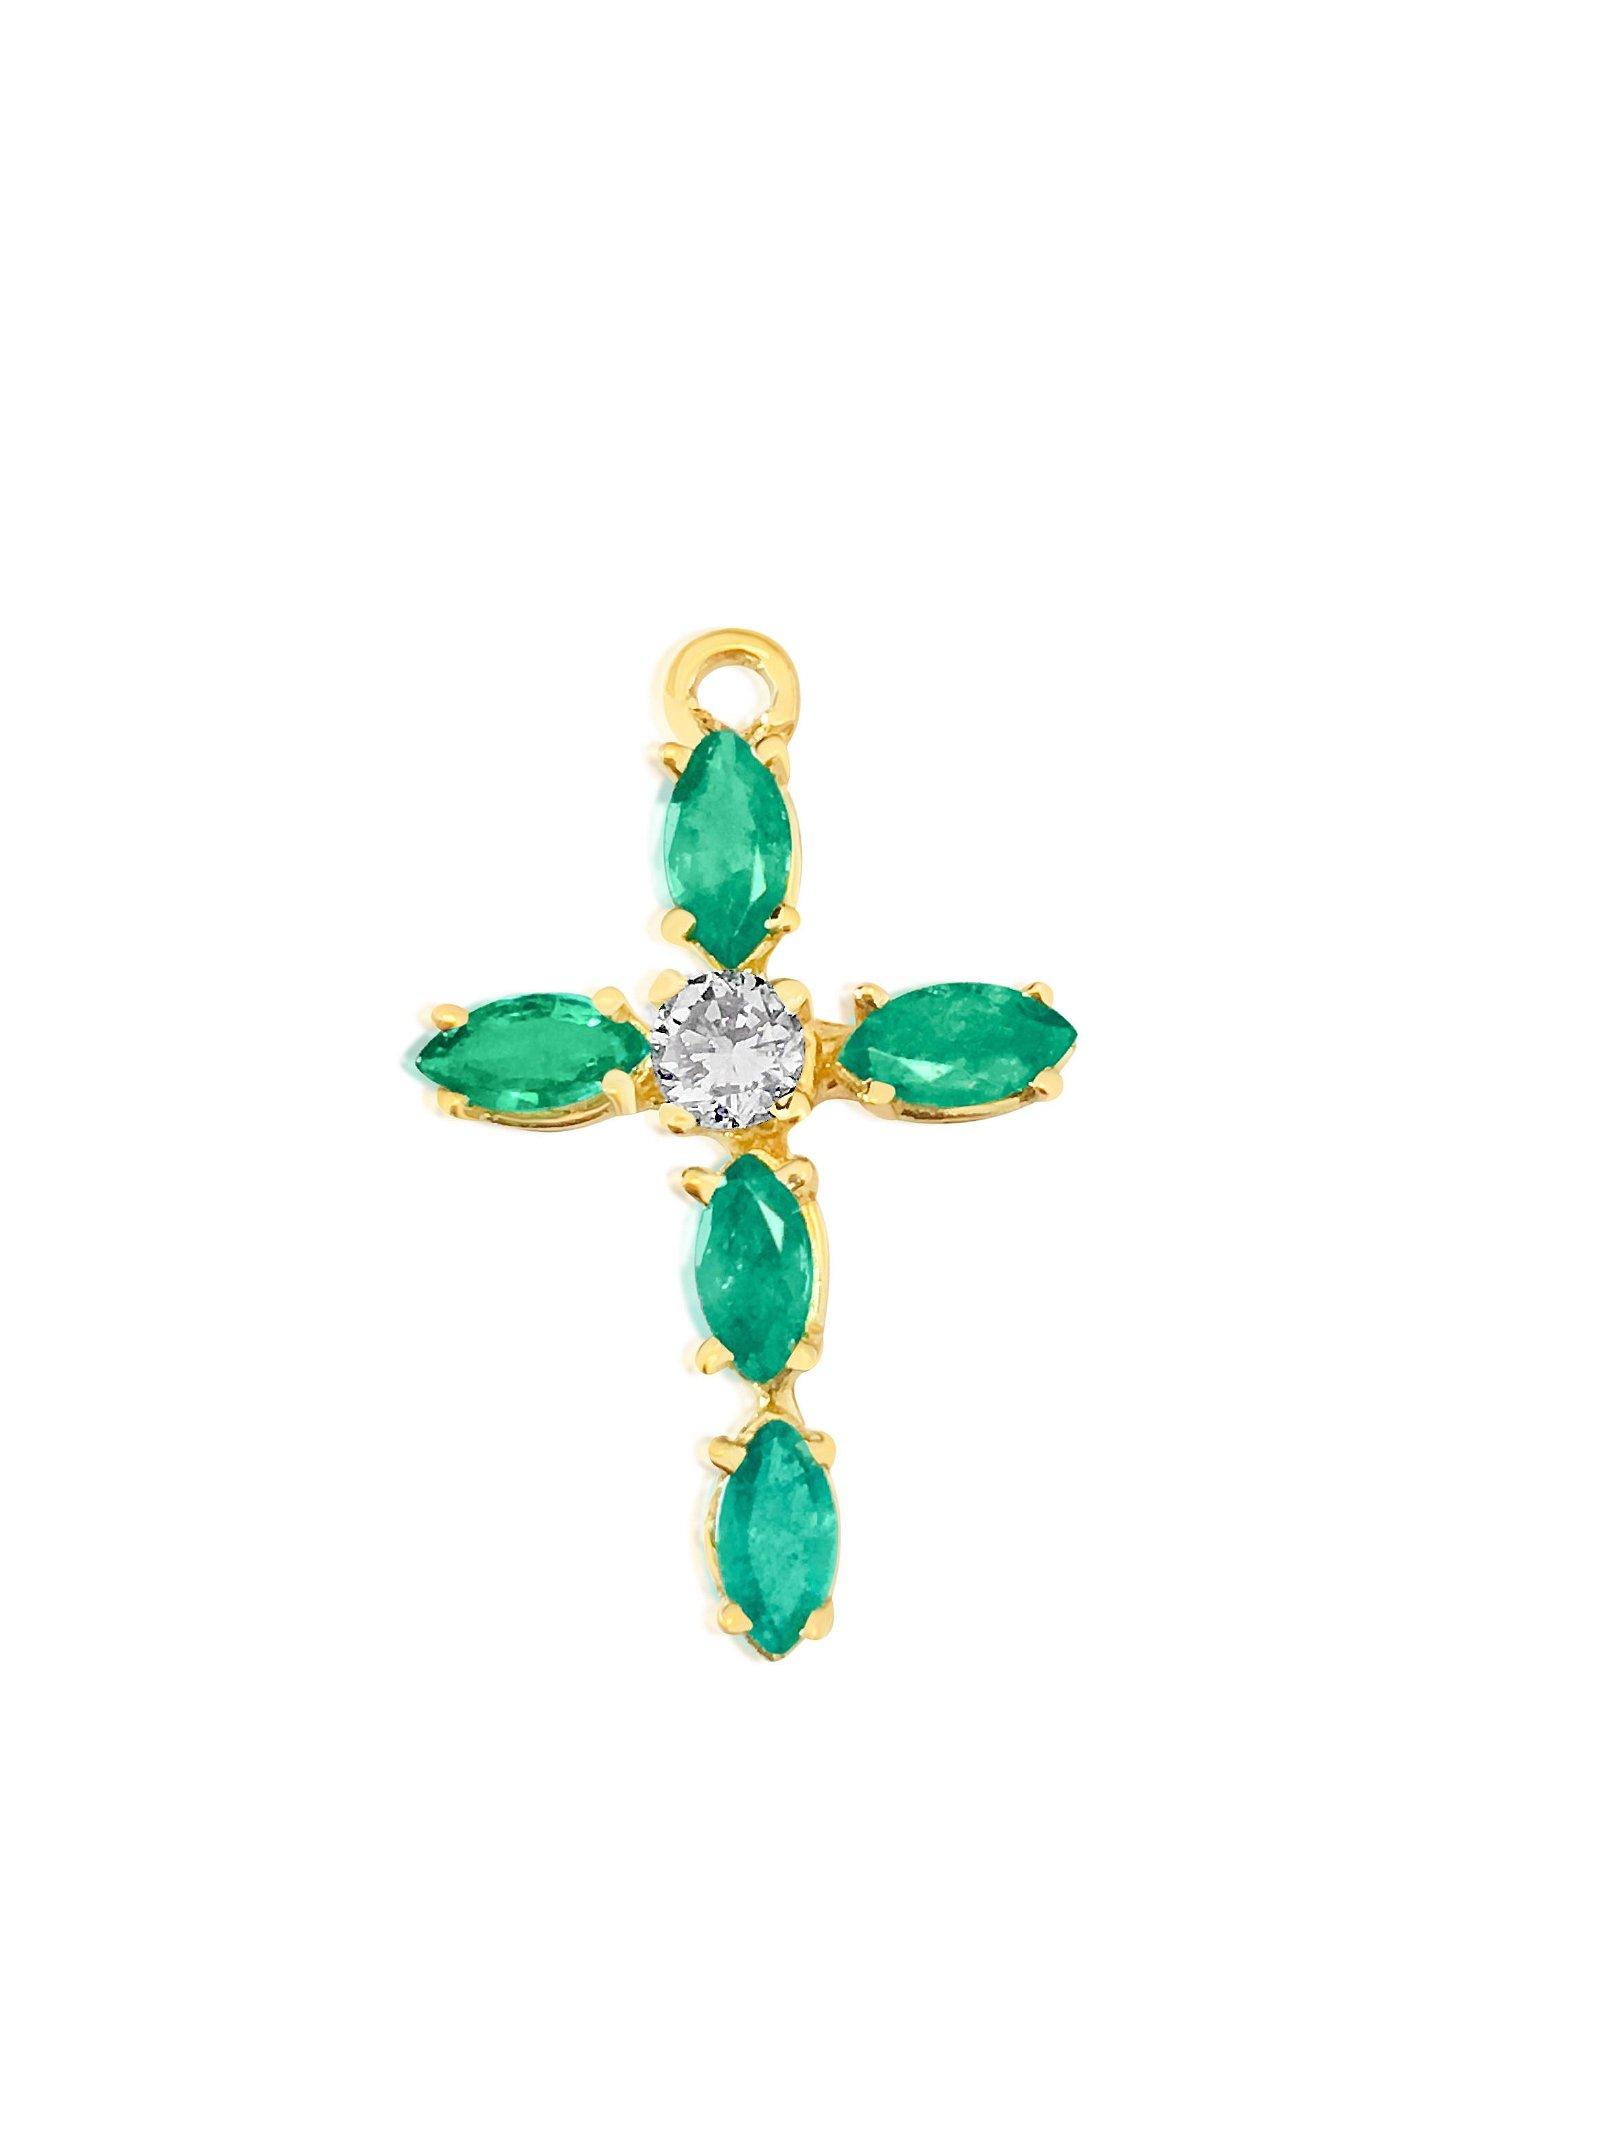 Vintage Religious Diamond & Emerald Cross in 14K